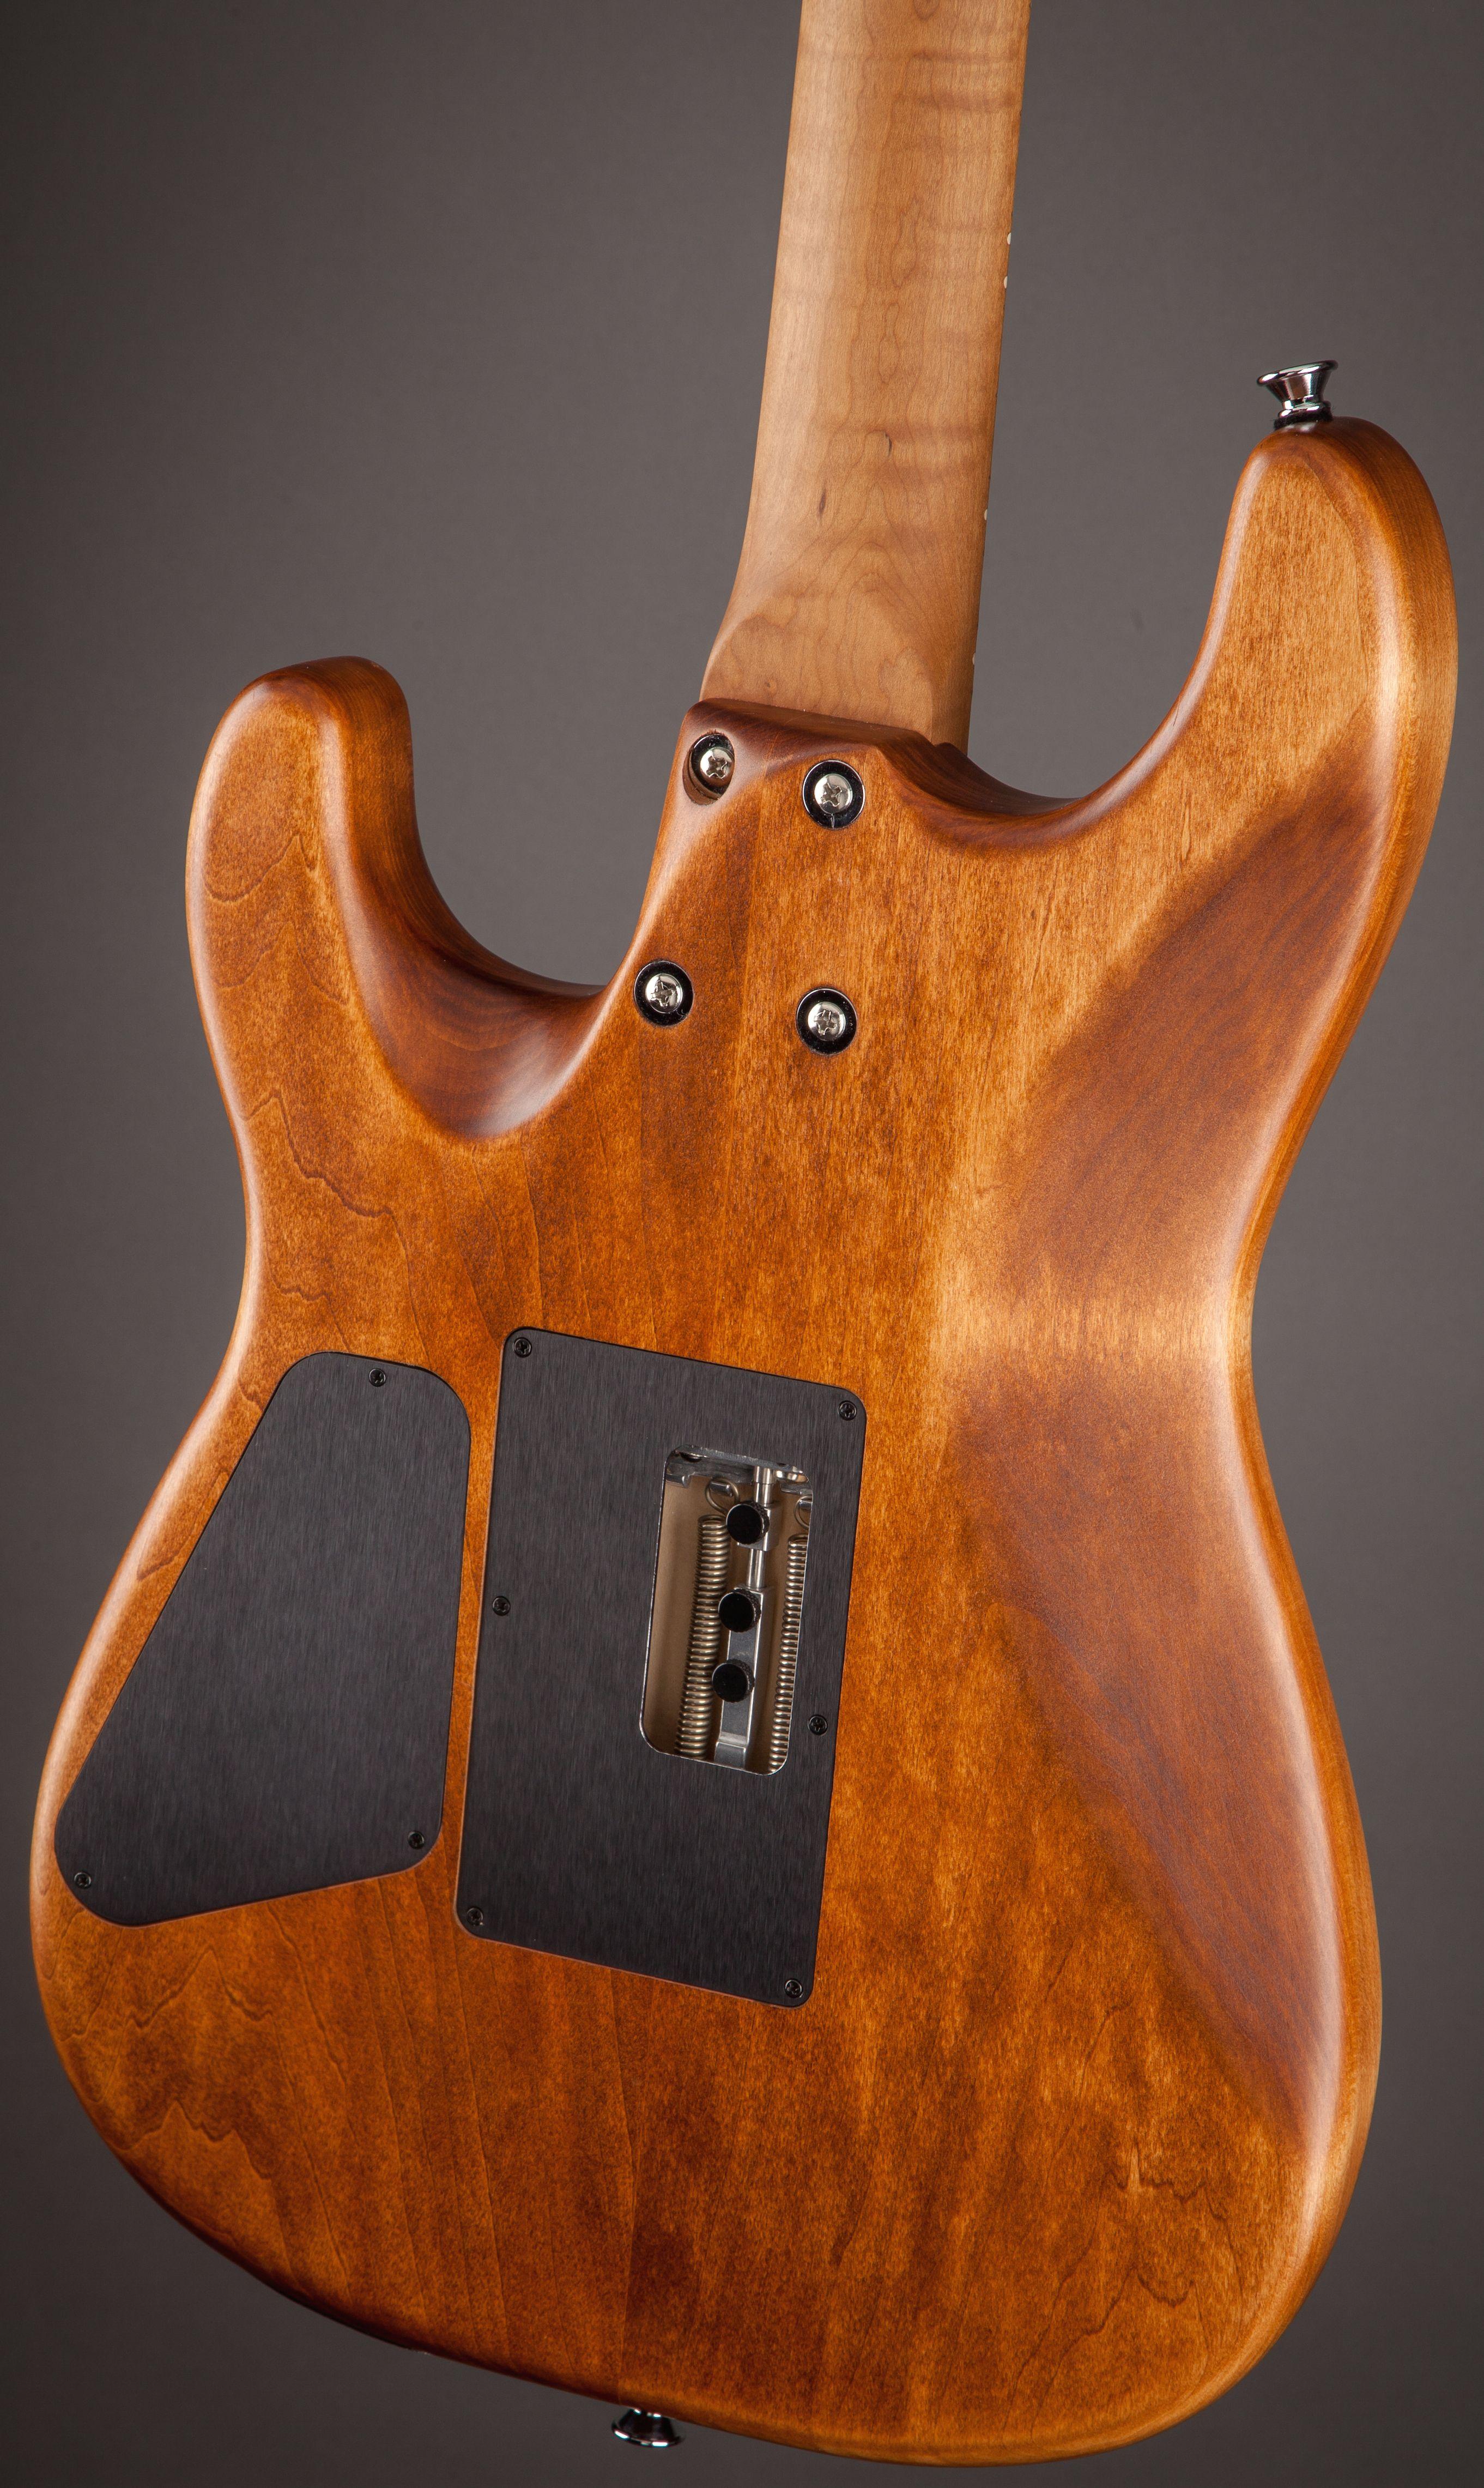 Pin By Ramses Morales On Beautiful Guitars Beautiful Guitars Guitar Kids Guthrie Govan